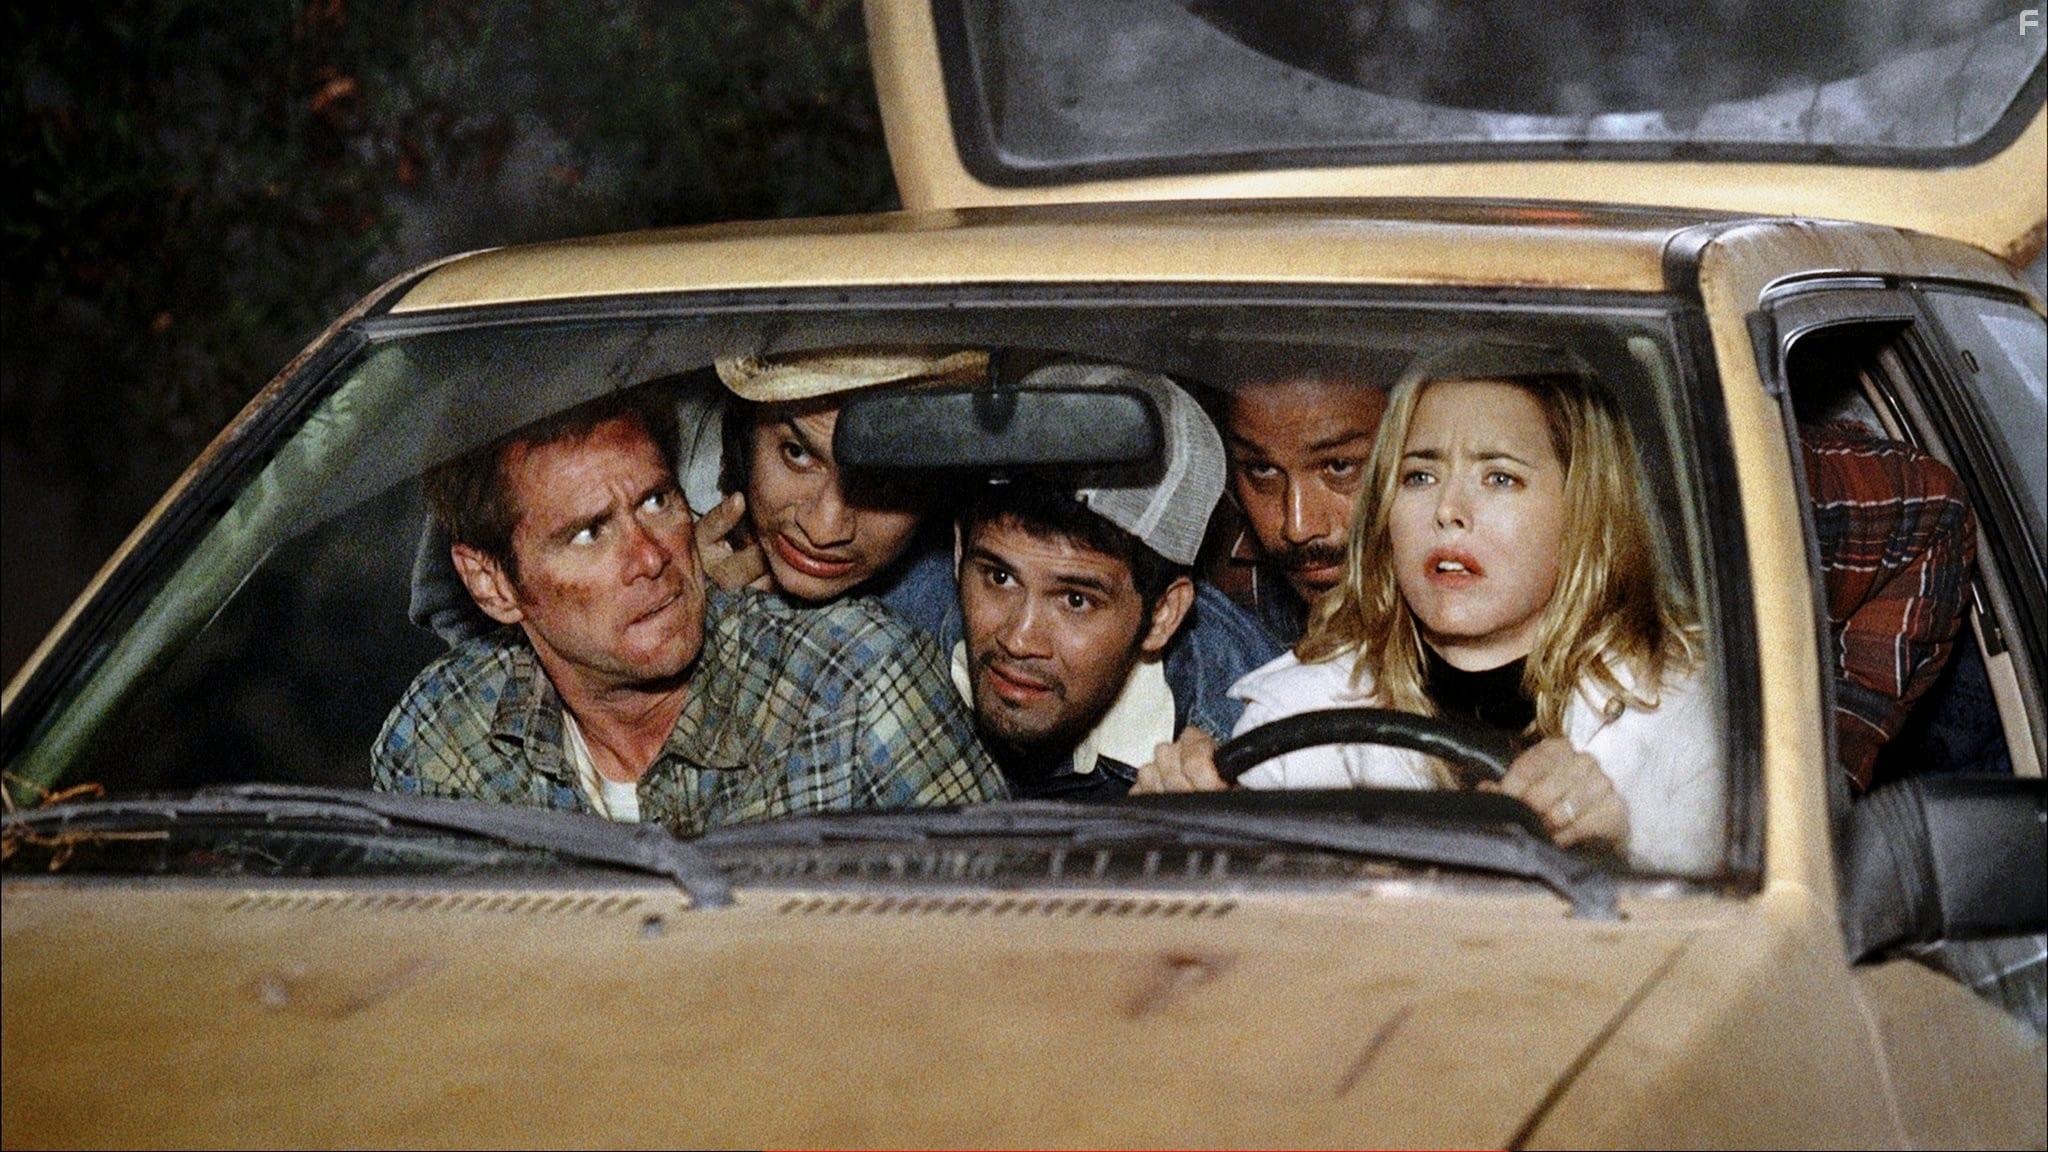 Rai Movie Dick & Jane - Operazione furto